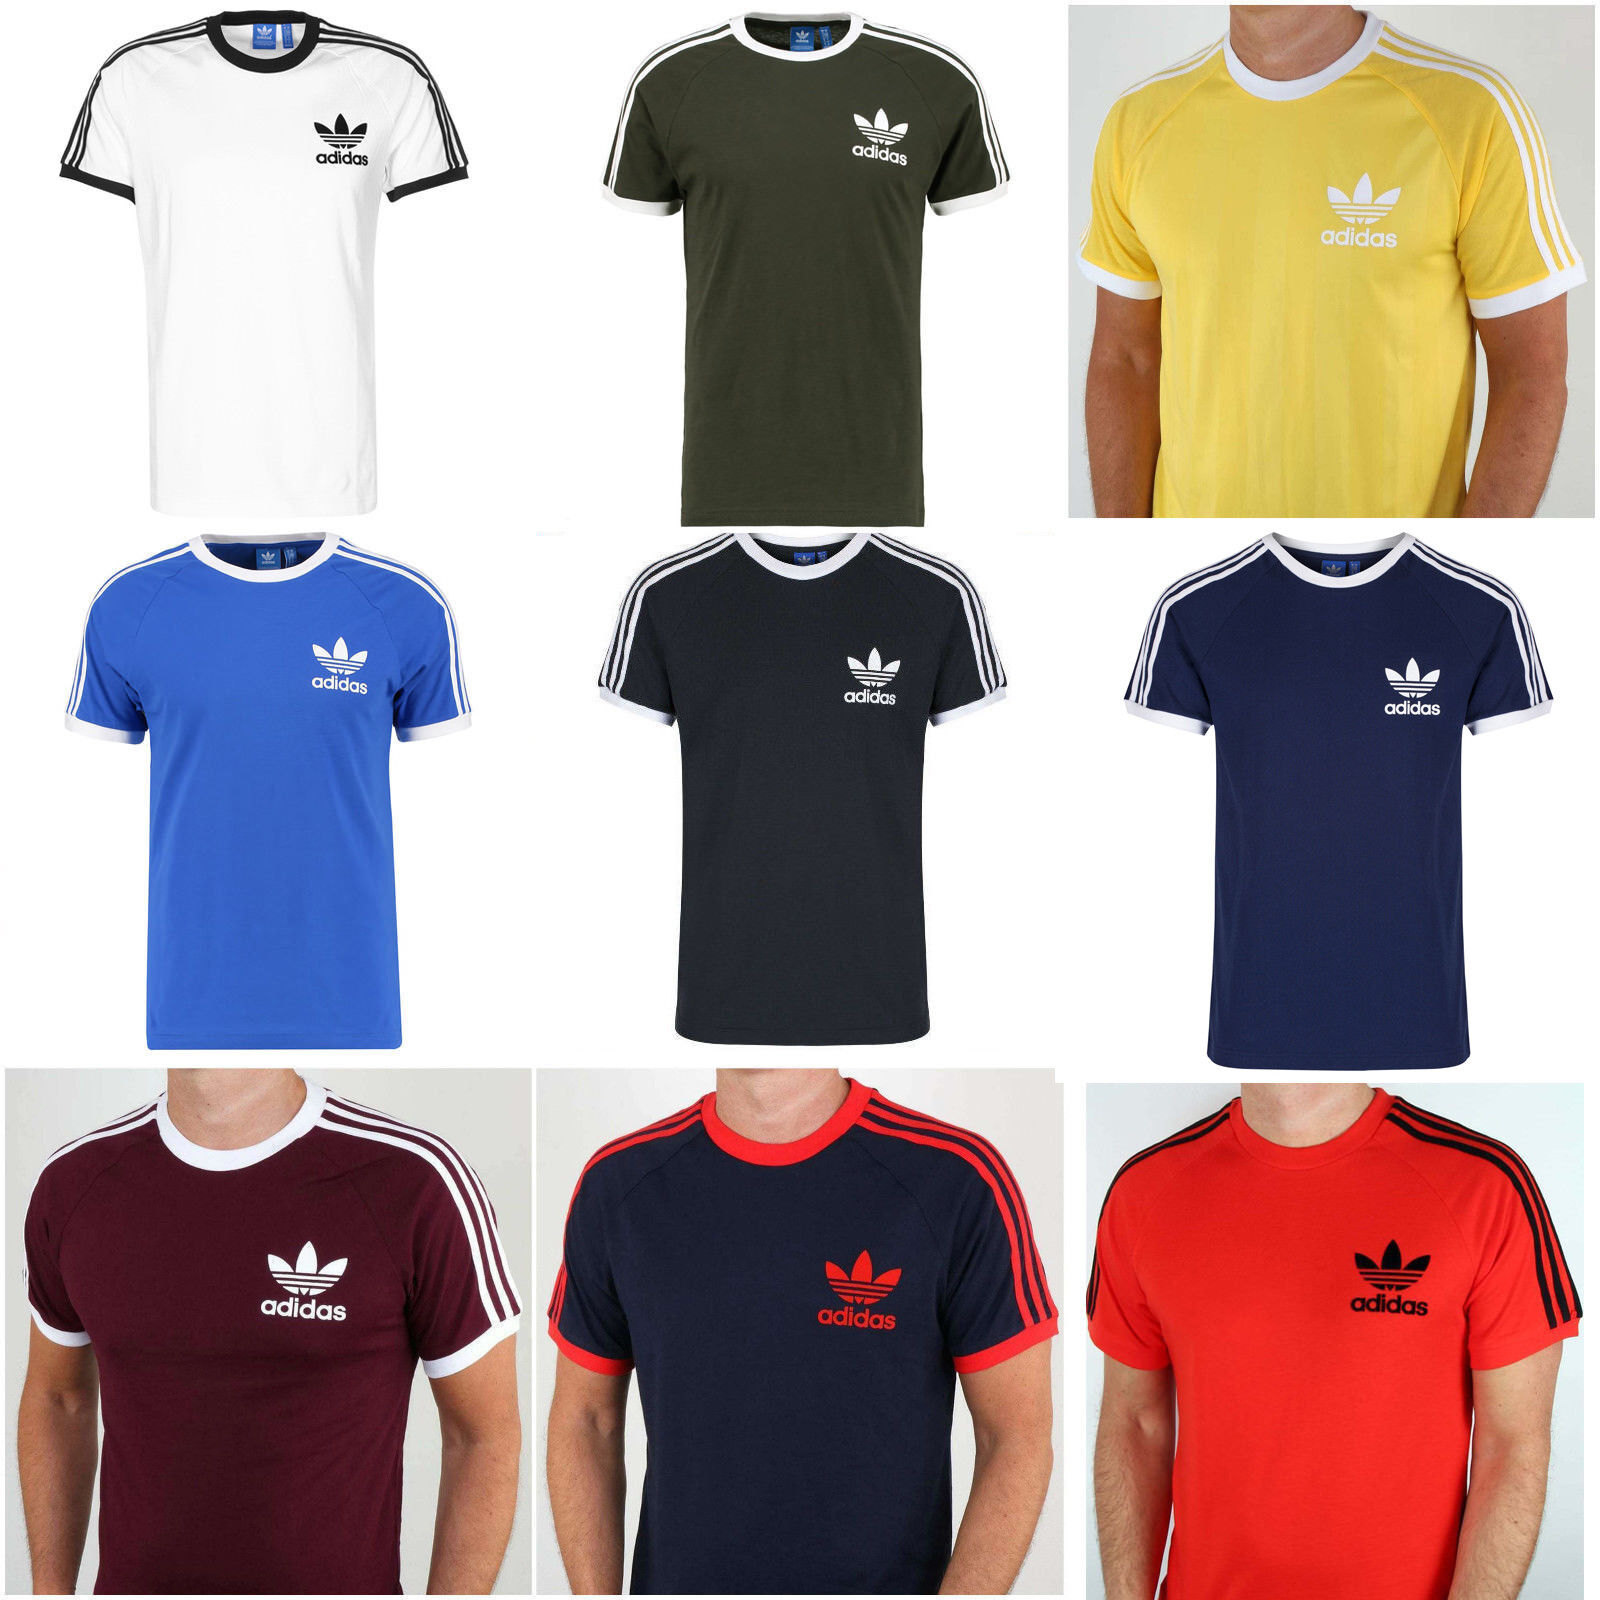 Adidas Mens Trefoil California Tees Crew Neck Retro T-Shirt Tee Top Sale